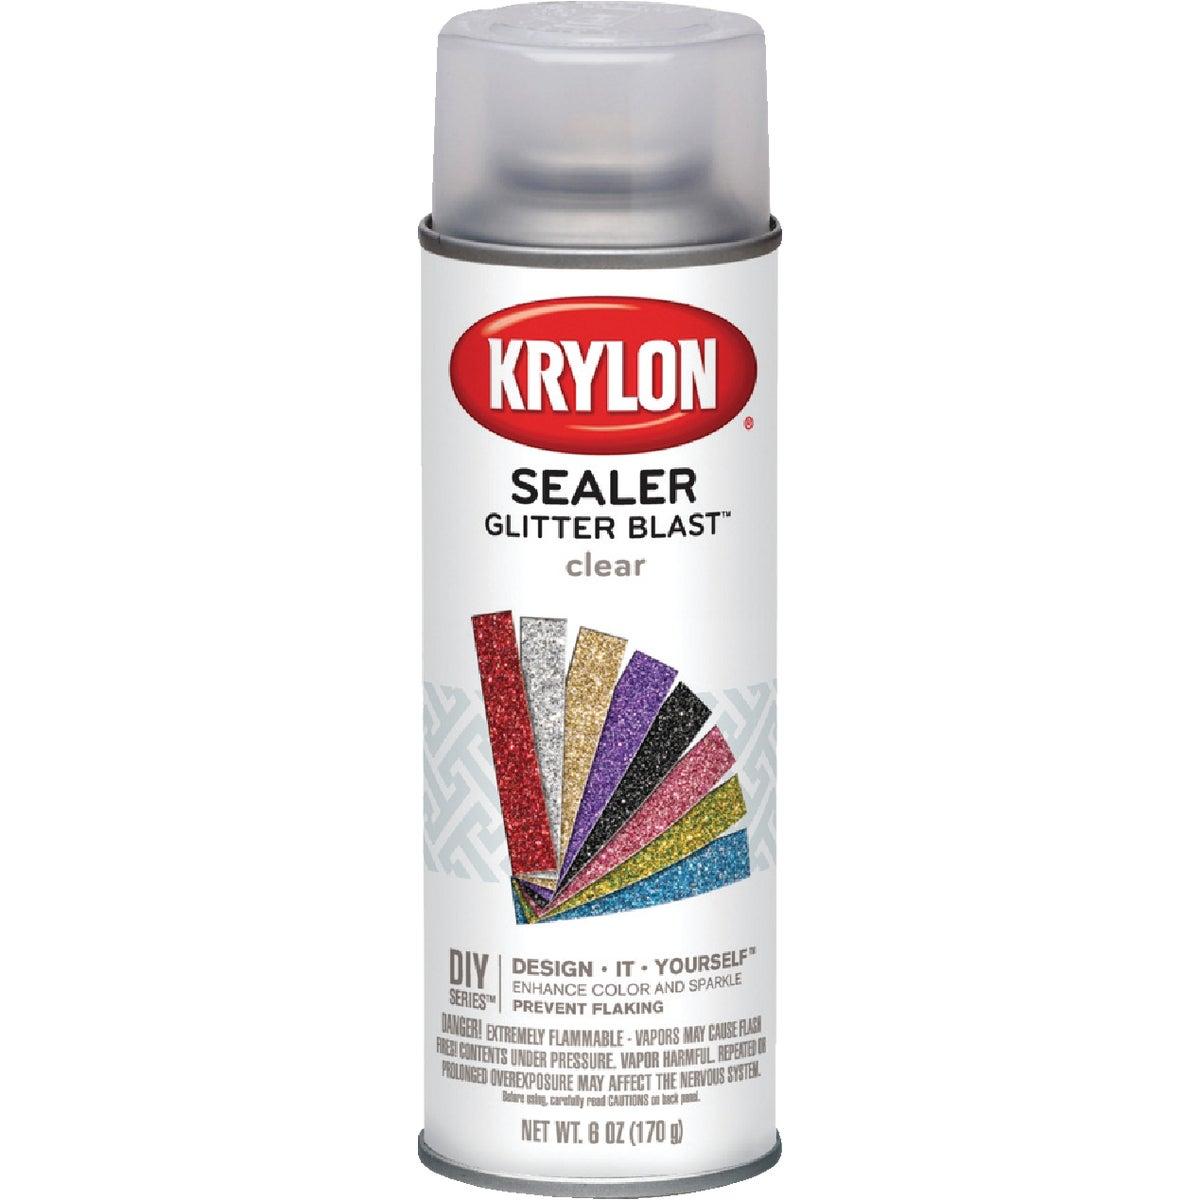 CLR SEALER GLITTER SPRAY - K03800000 by Krylon/consumer Div